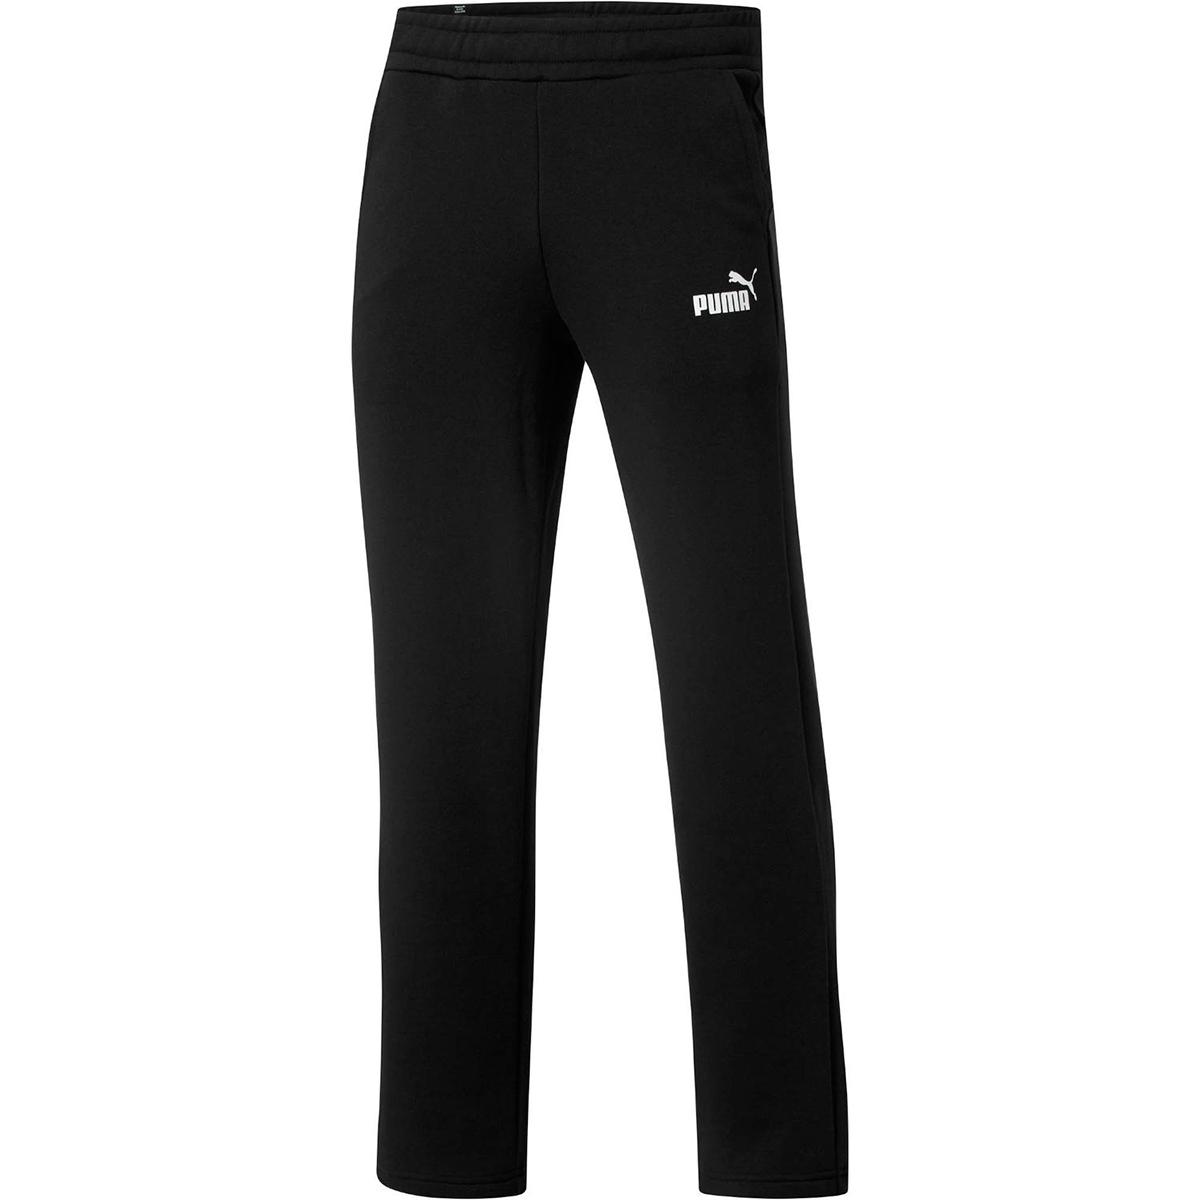 Puma Men's Essential Logo Open-Hem Pants - Black, XXL